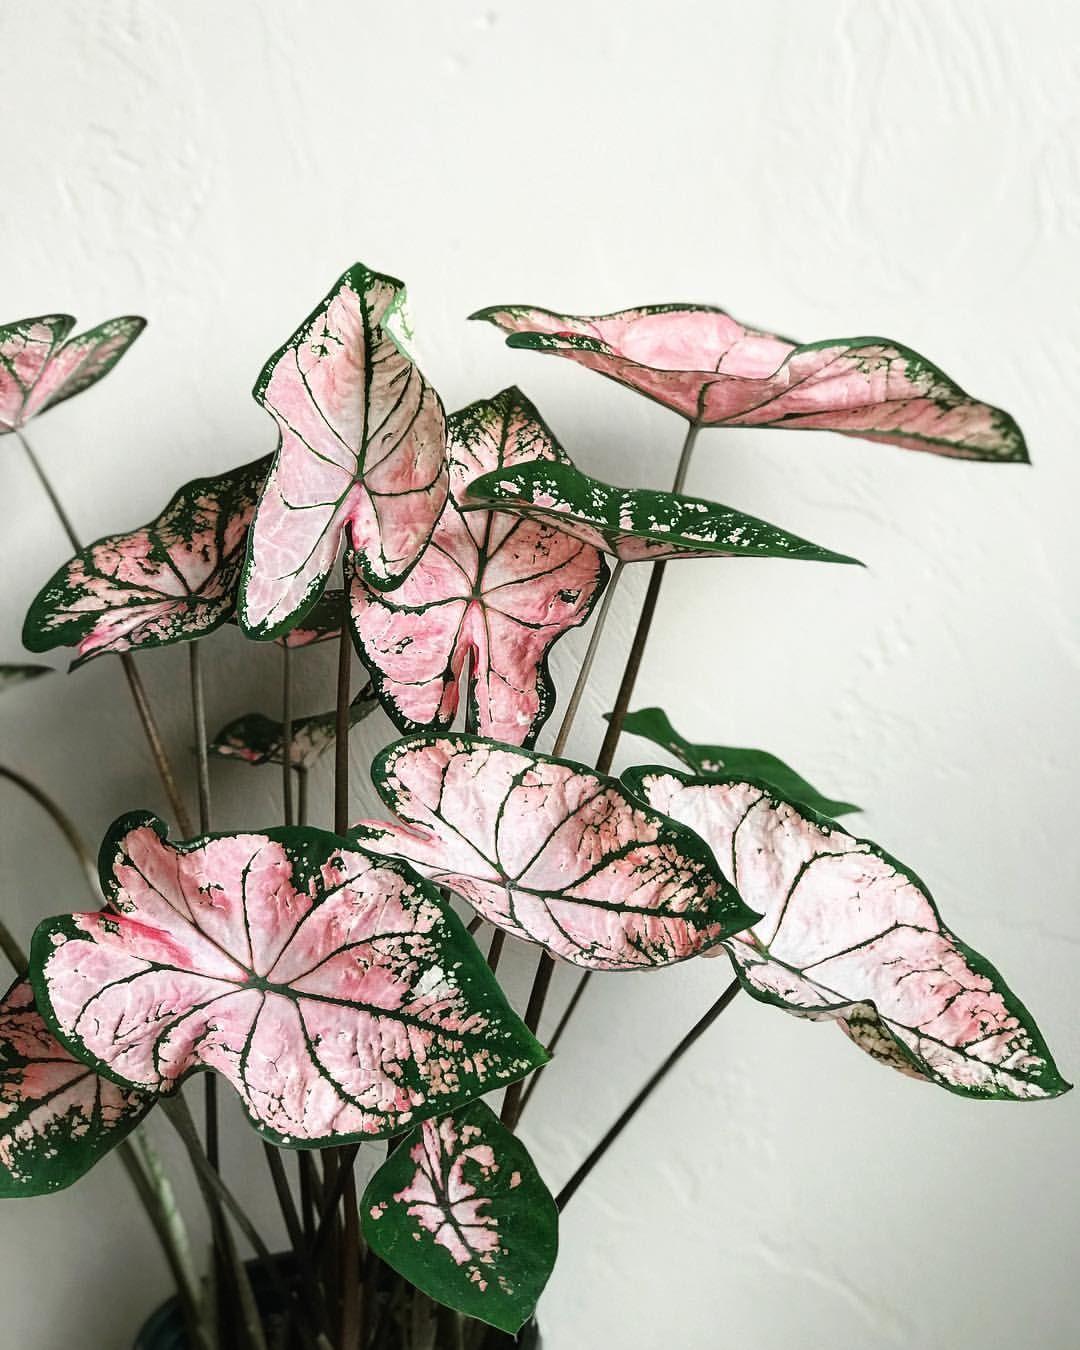 "Photo of 𝙺𝚊𝚝𝚎𝚕𝚢𝚗𝚗 𝚁𝚒𝚌𝚑𝚎𝚕𝚕𝚎 ✧ on Instagram: ""💗✨ Pink Caladium ✨💗 . . . #🌱 #🌿 #botanical  #caladium #flauntyourleaves  #foliage  #greenery #greenhousehunter #greenthumb  #houseplants…"""